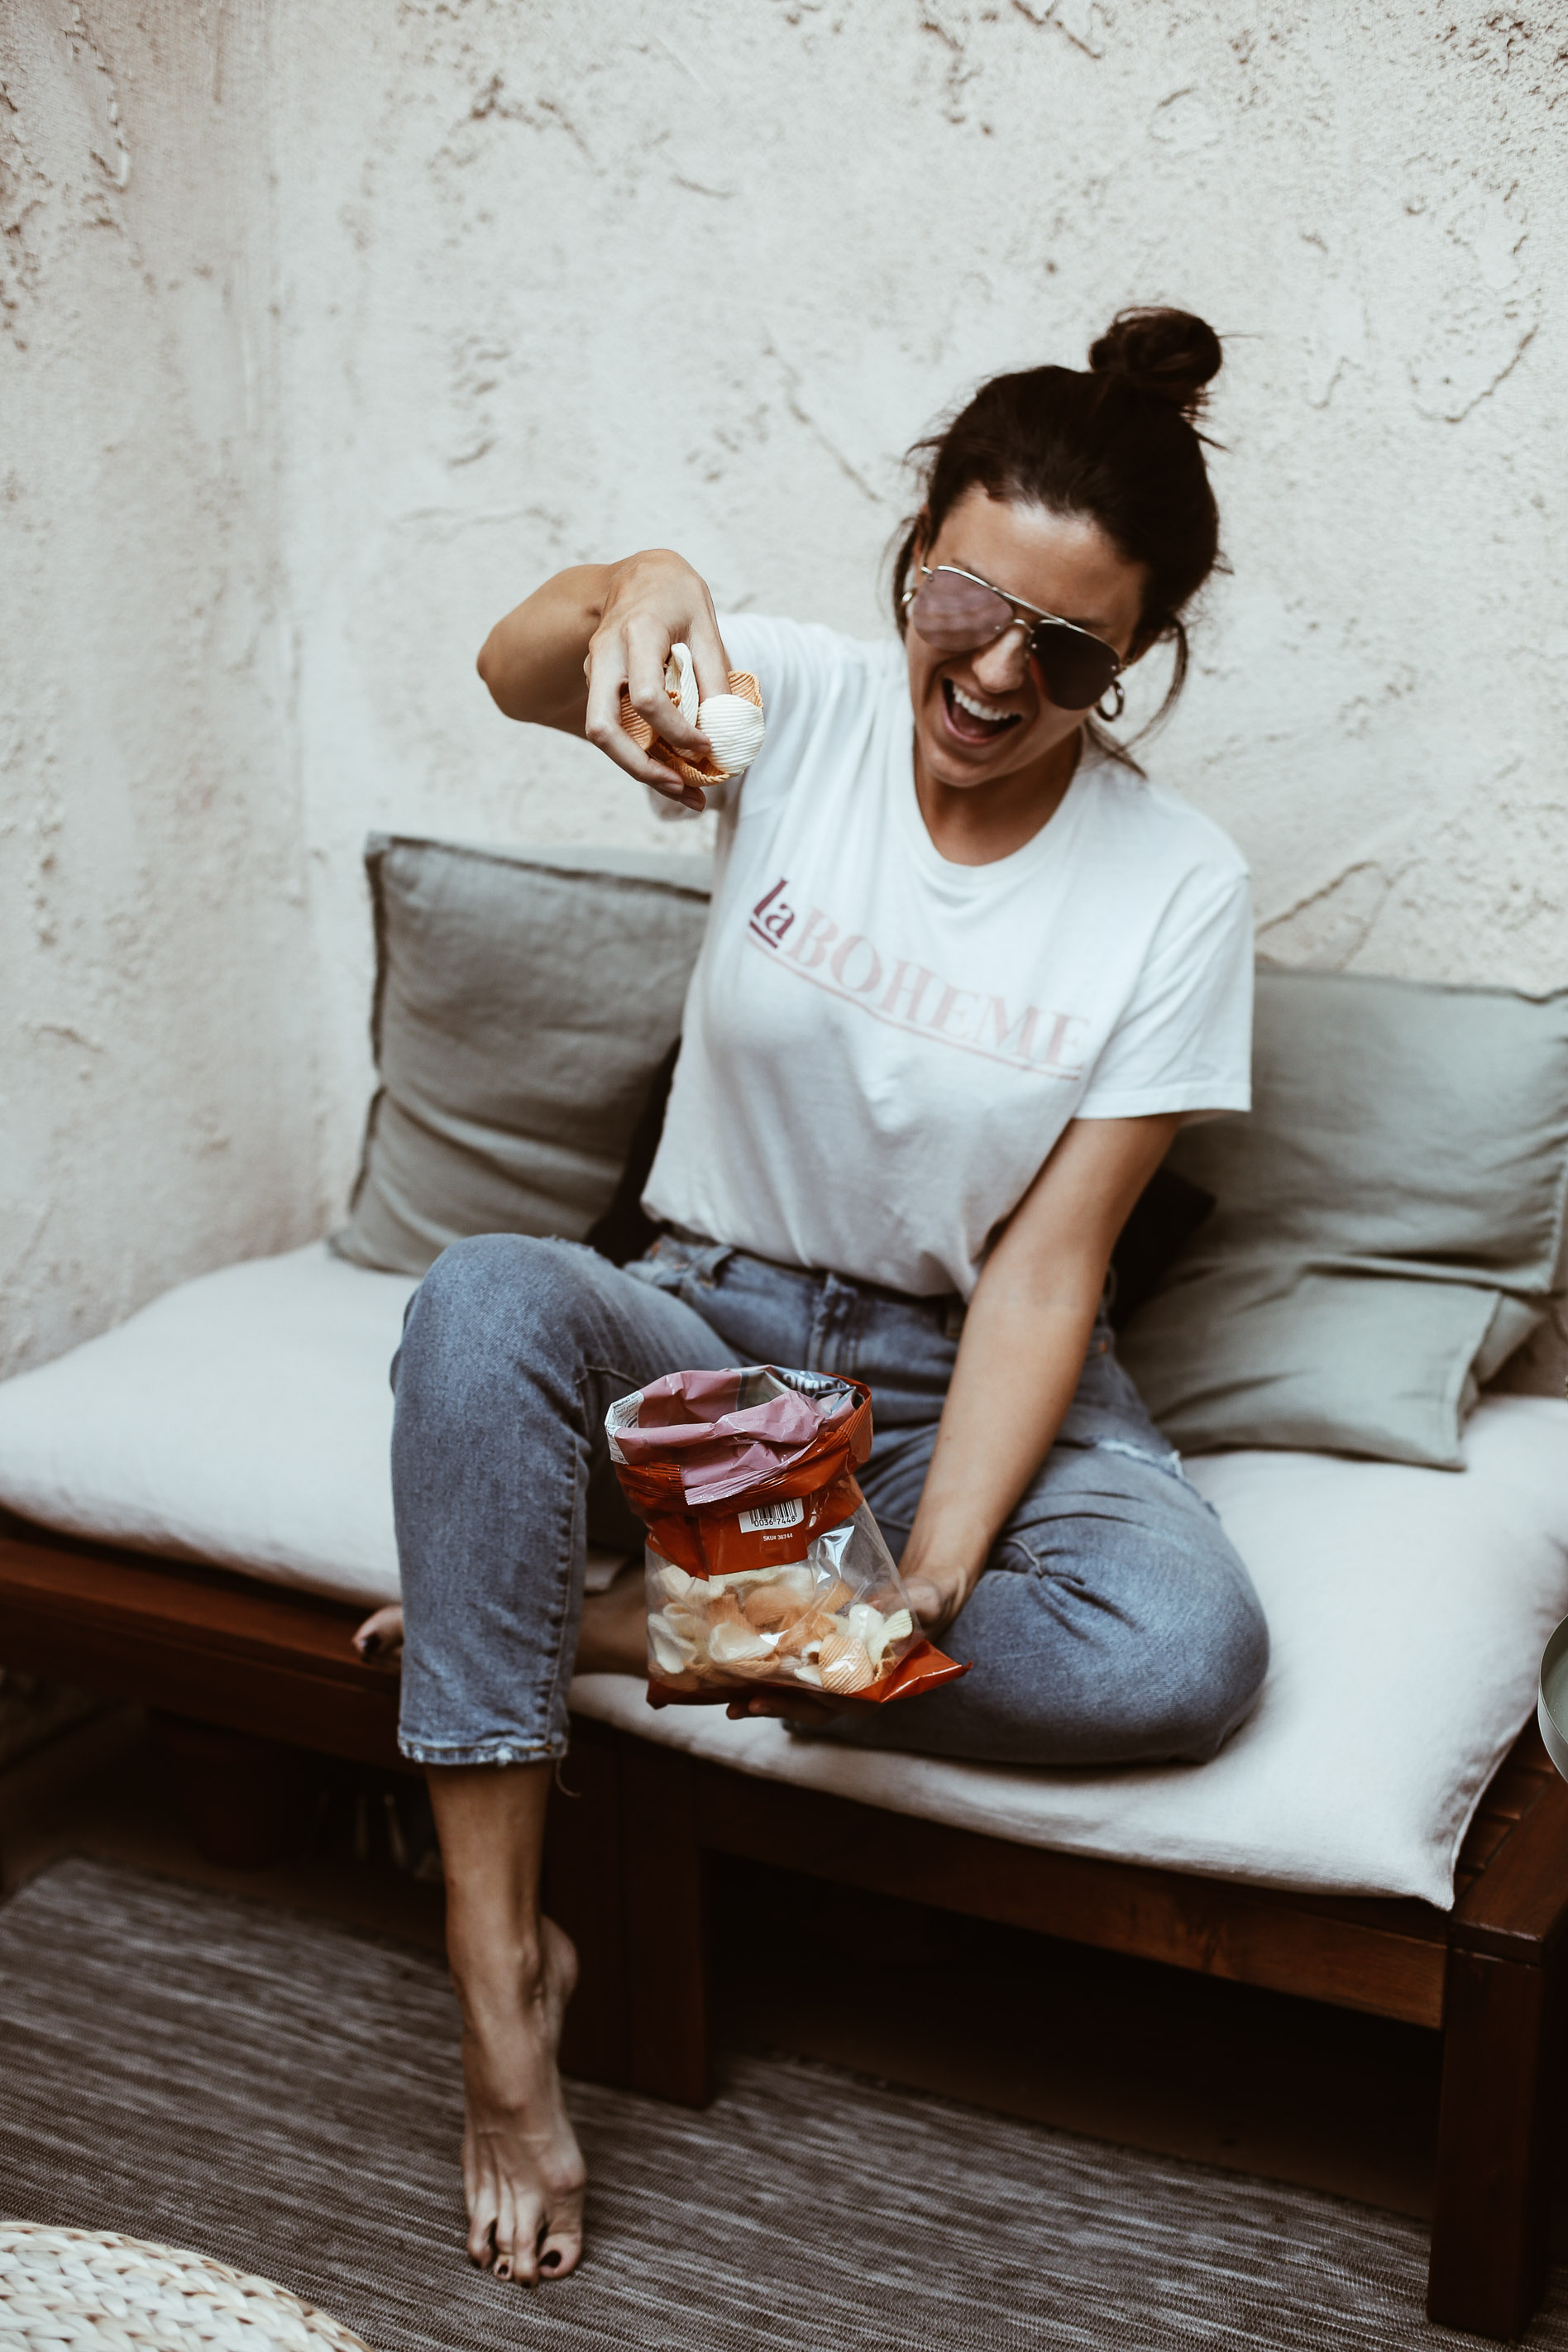 healthy snack ideas3.jpg